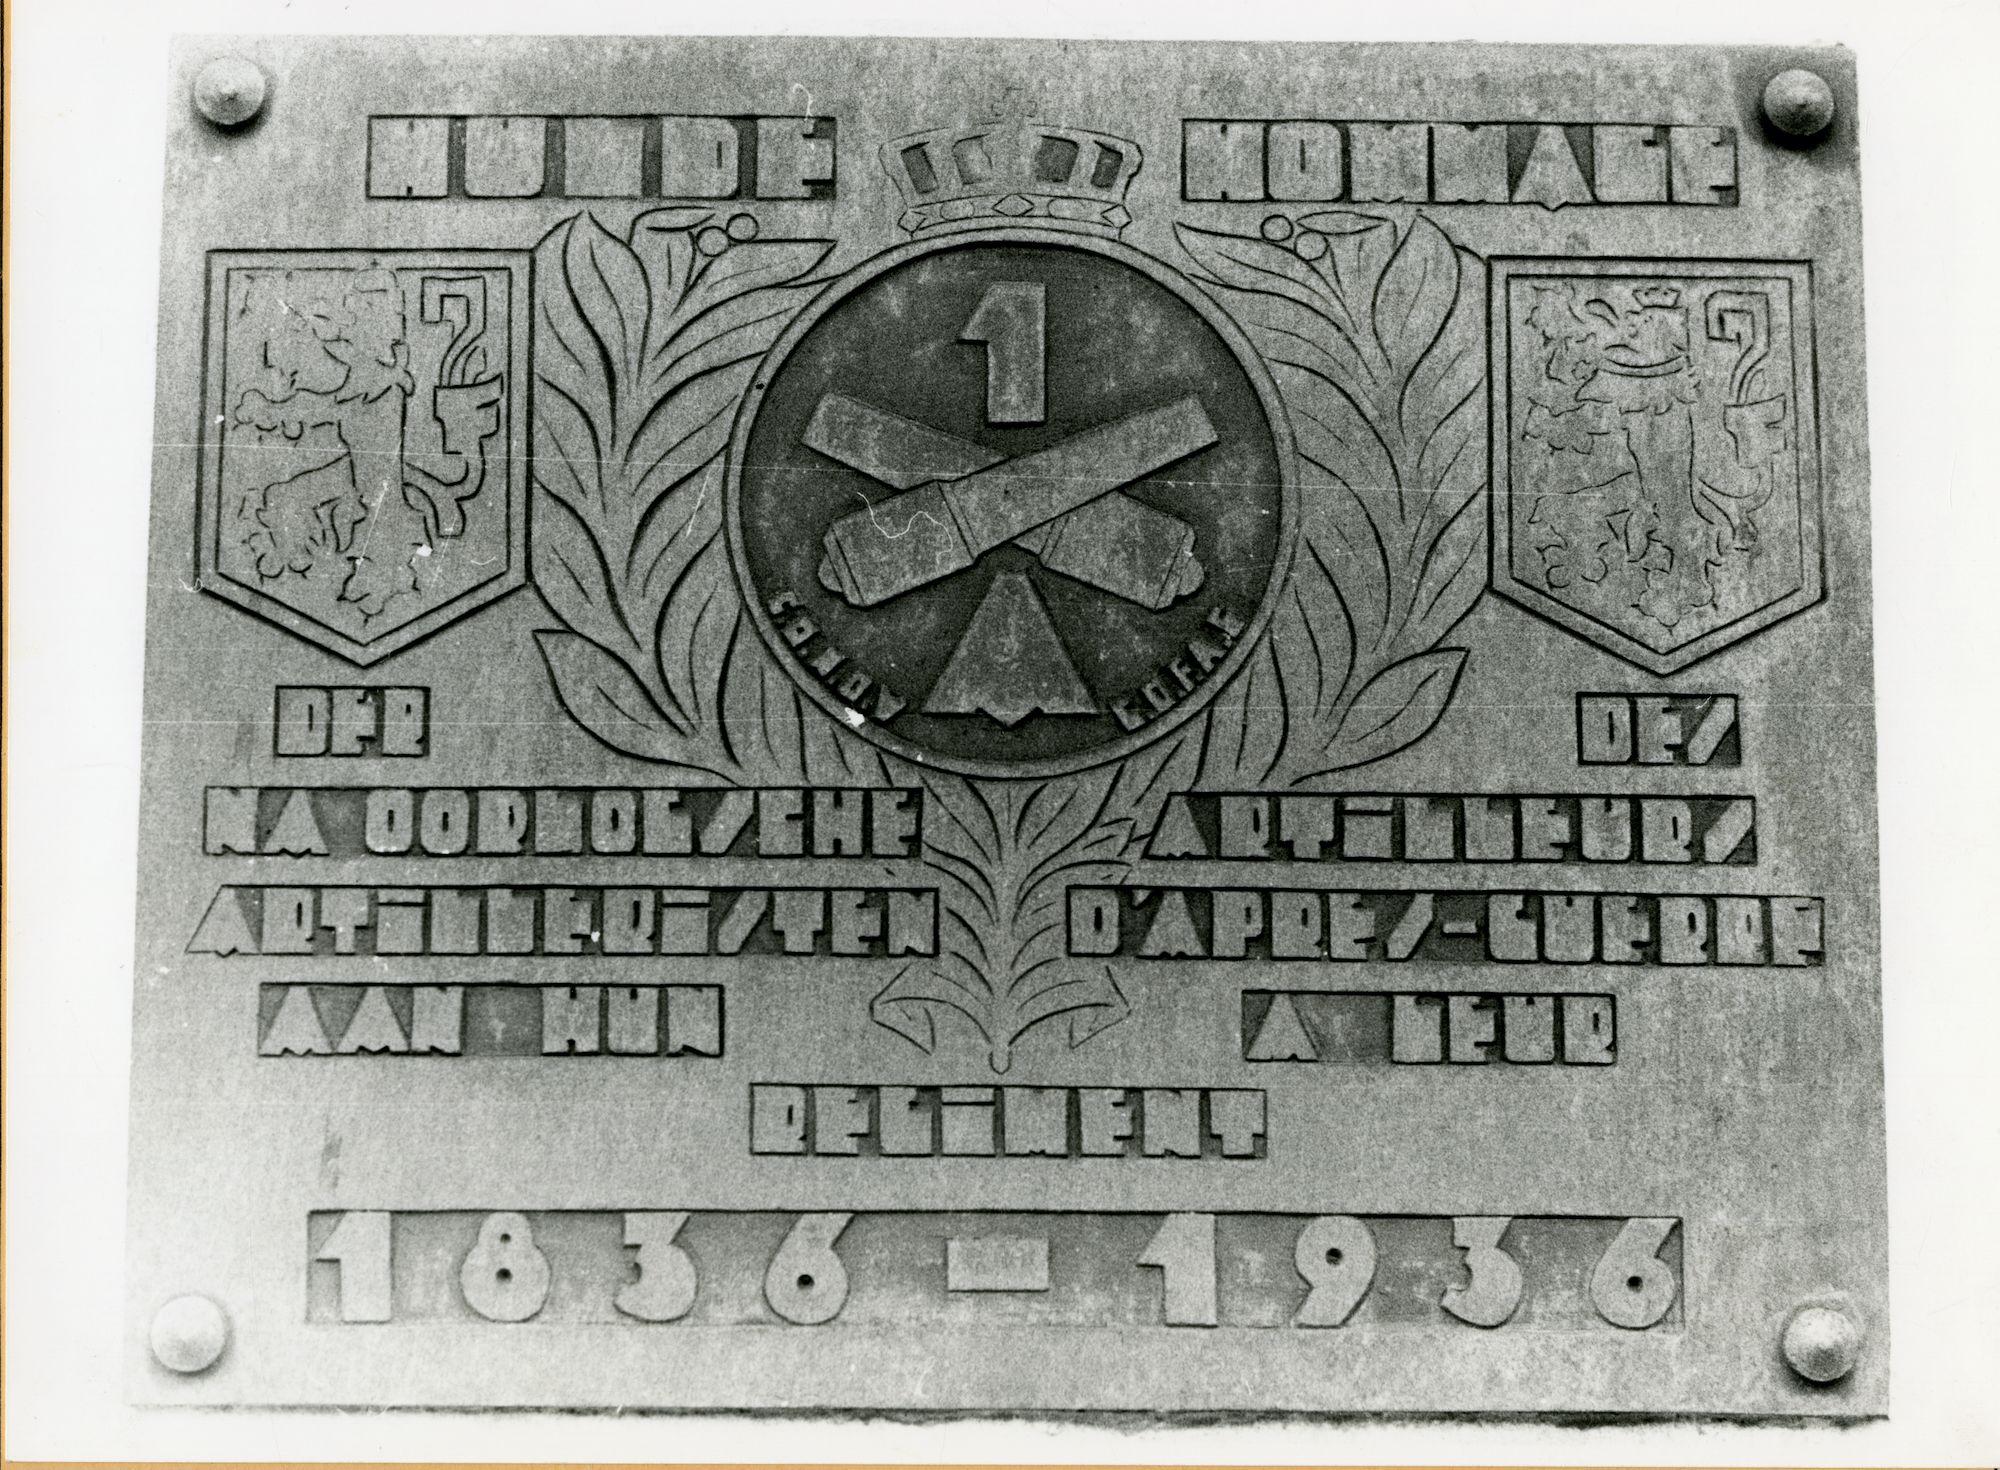 Gent: Brusselsepoortstraat: kazerne De Hollain: Gedenkplaat: na-oorlogse artilleristen, 1979